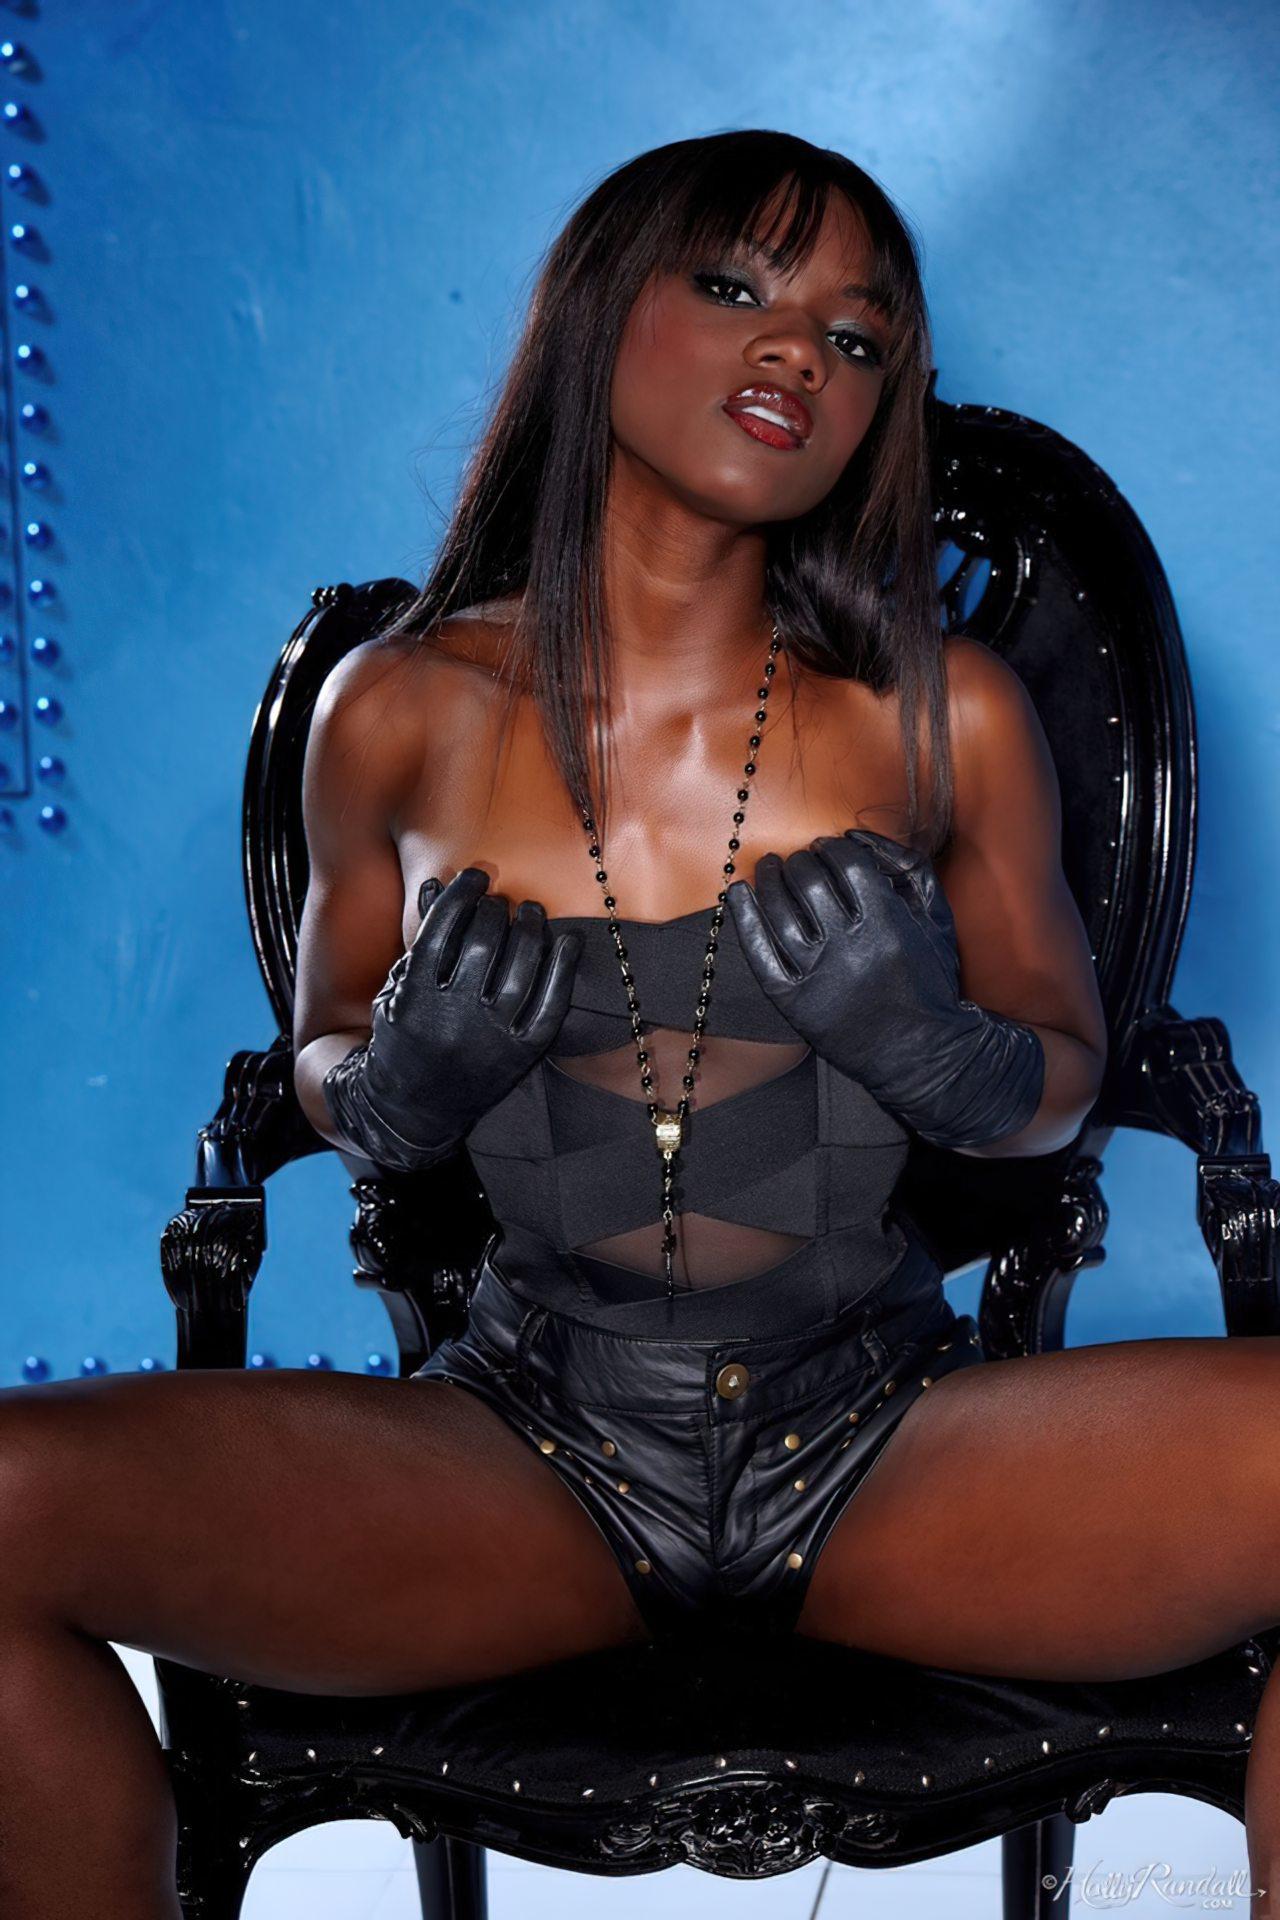 Ana Foxx Lingerie Negra (3)